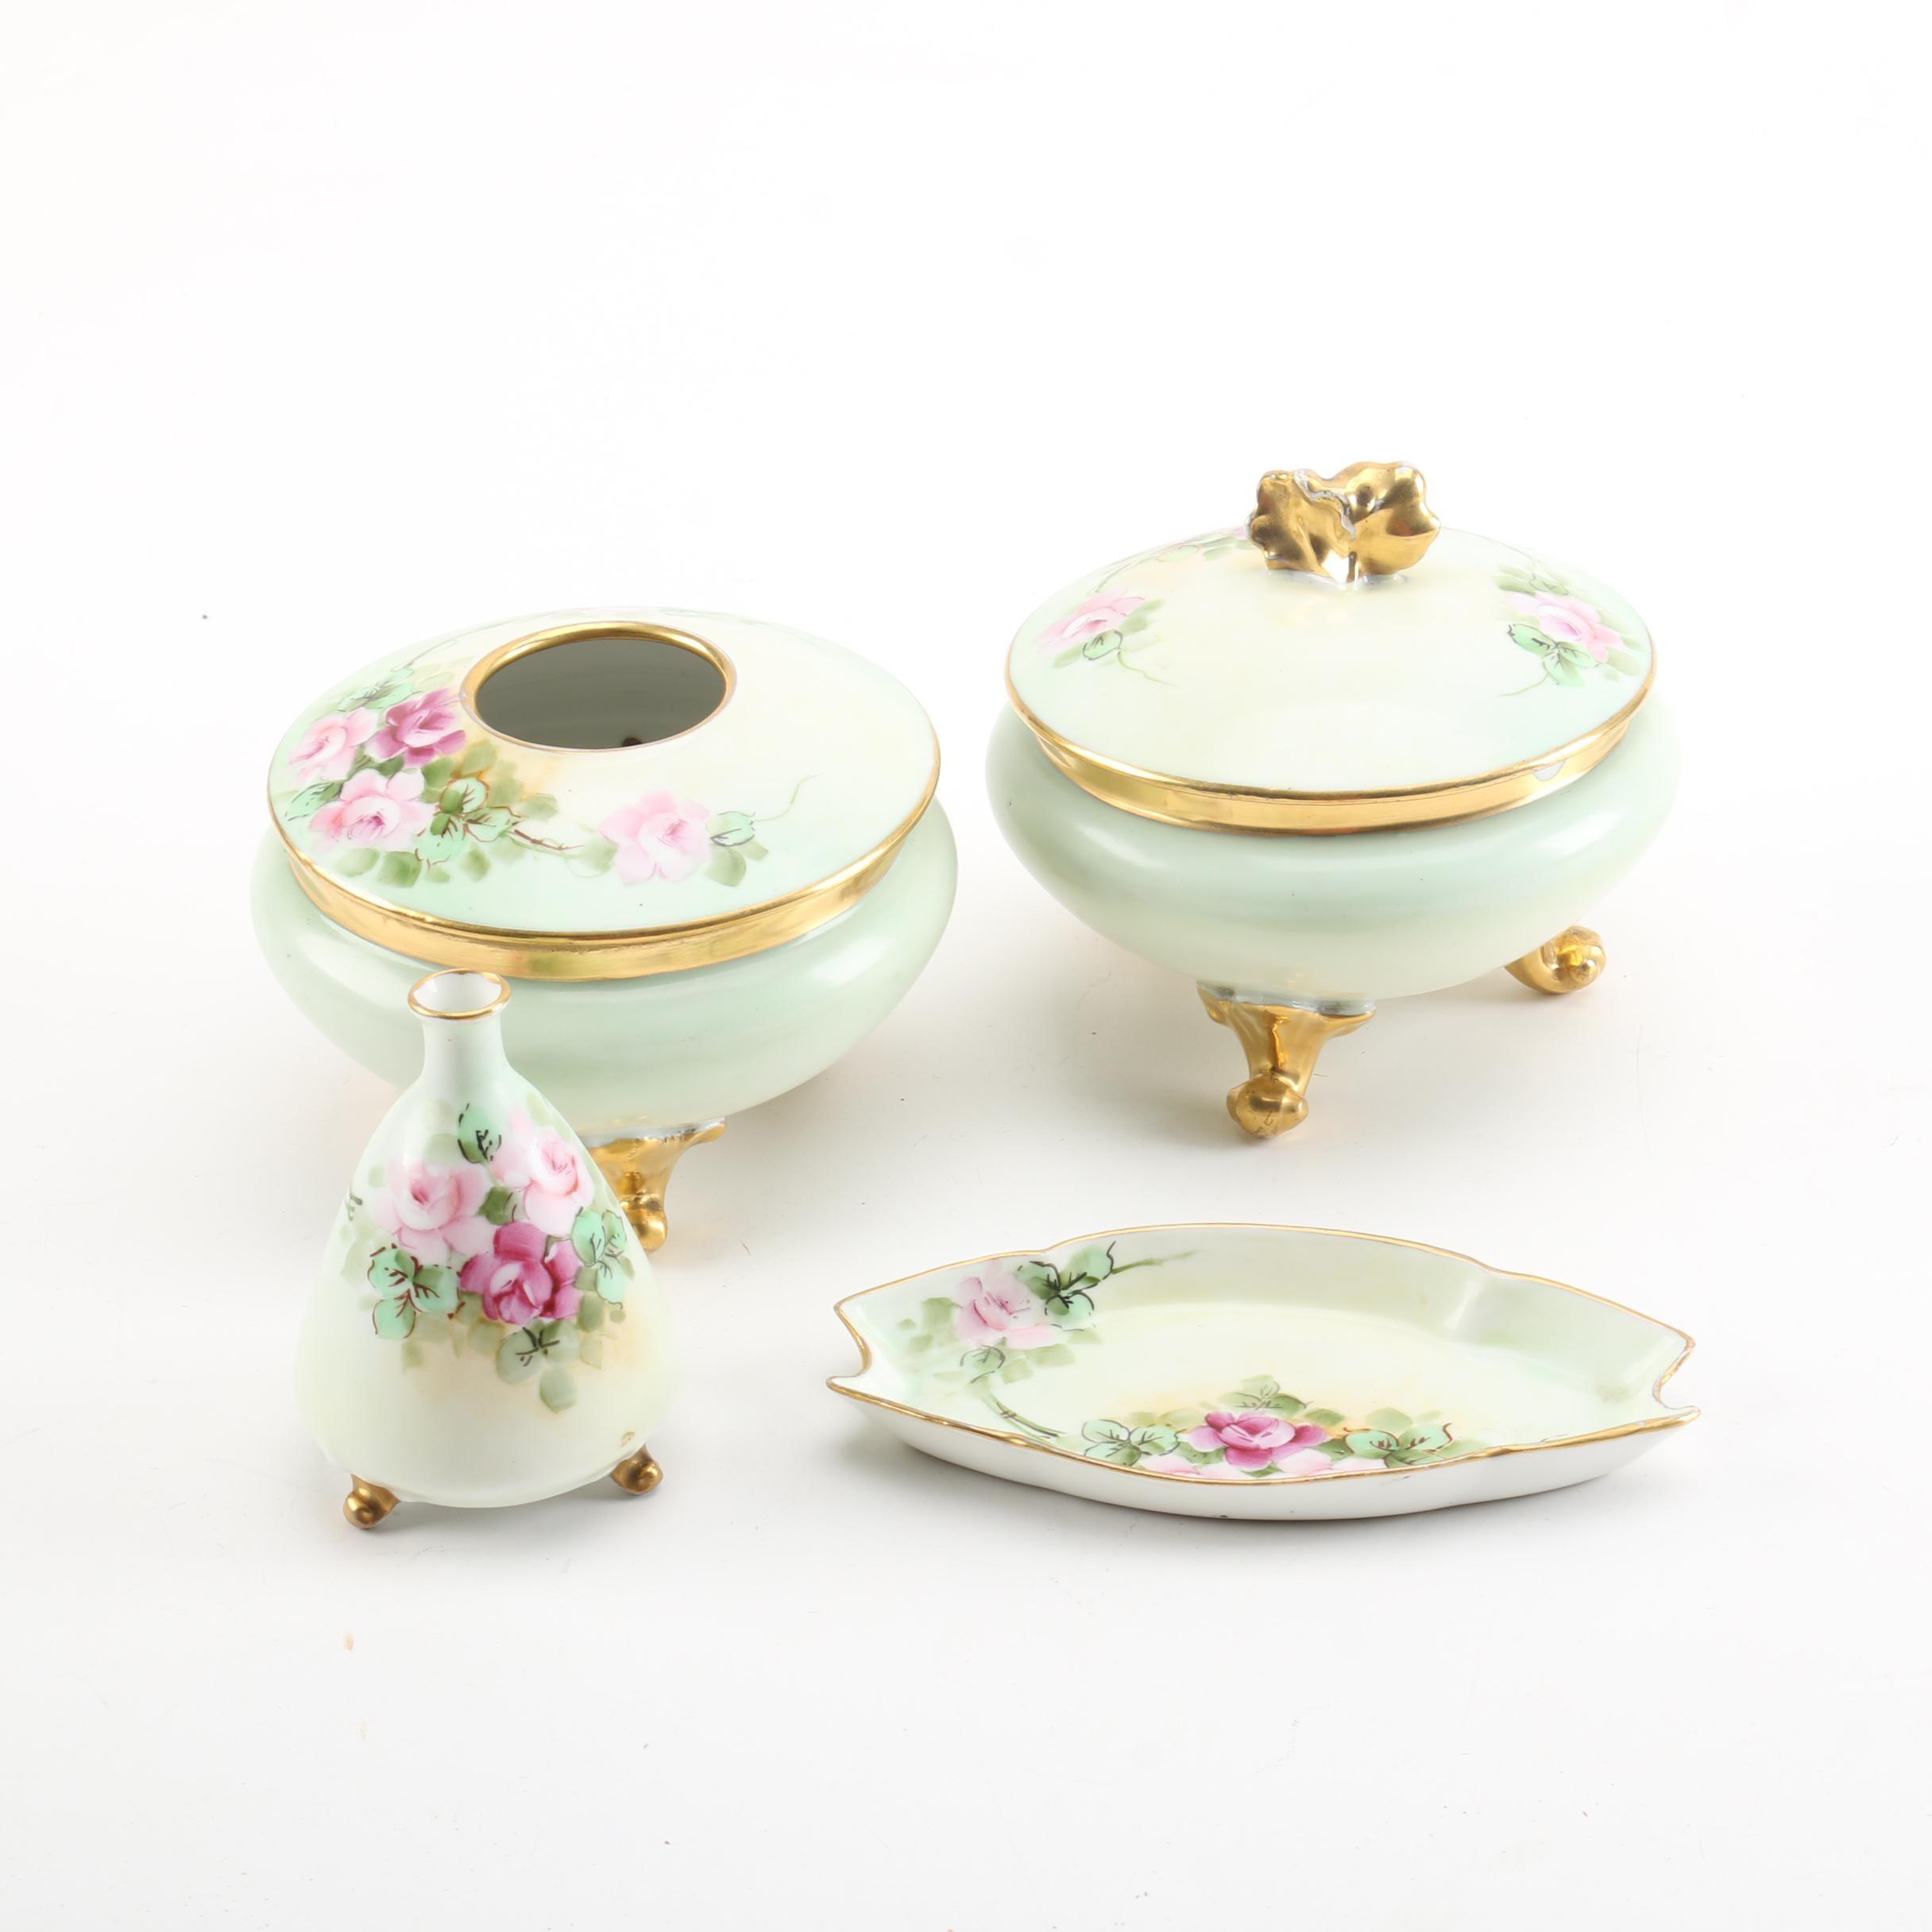 PL Limoges and O&EG Royal Austria Vanity Decor